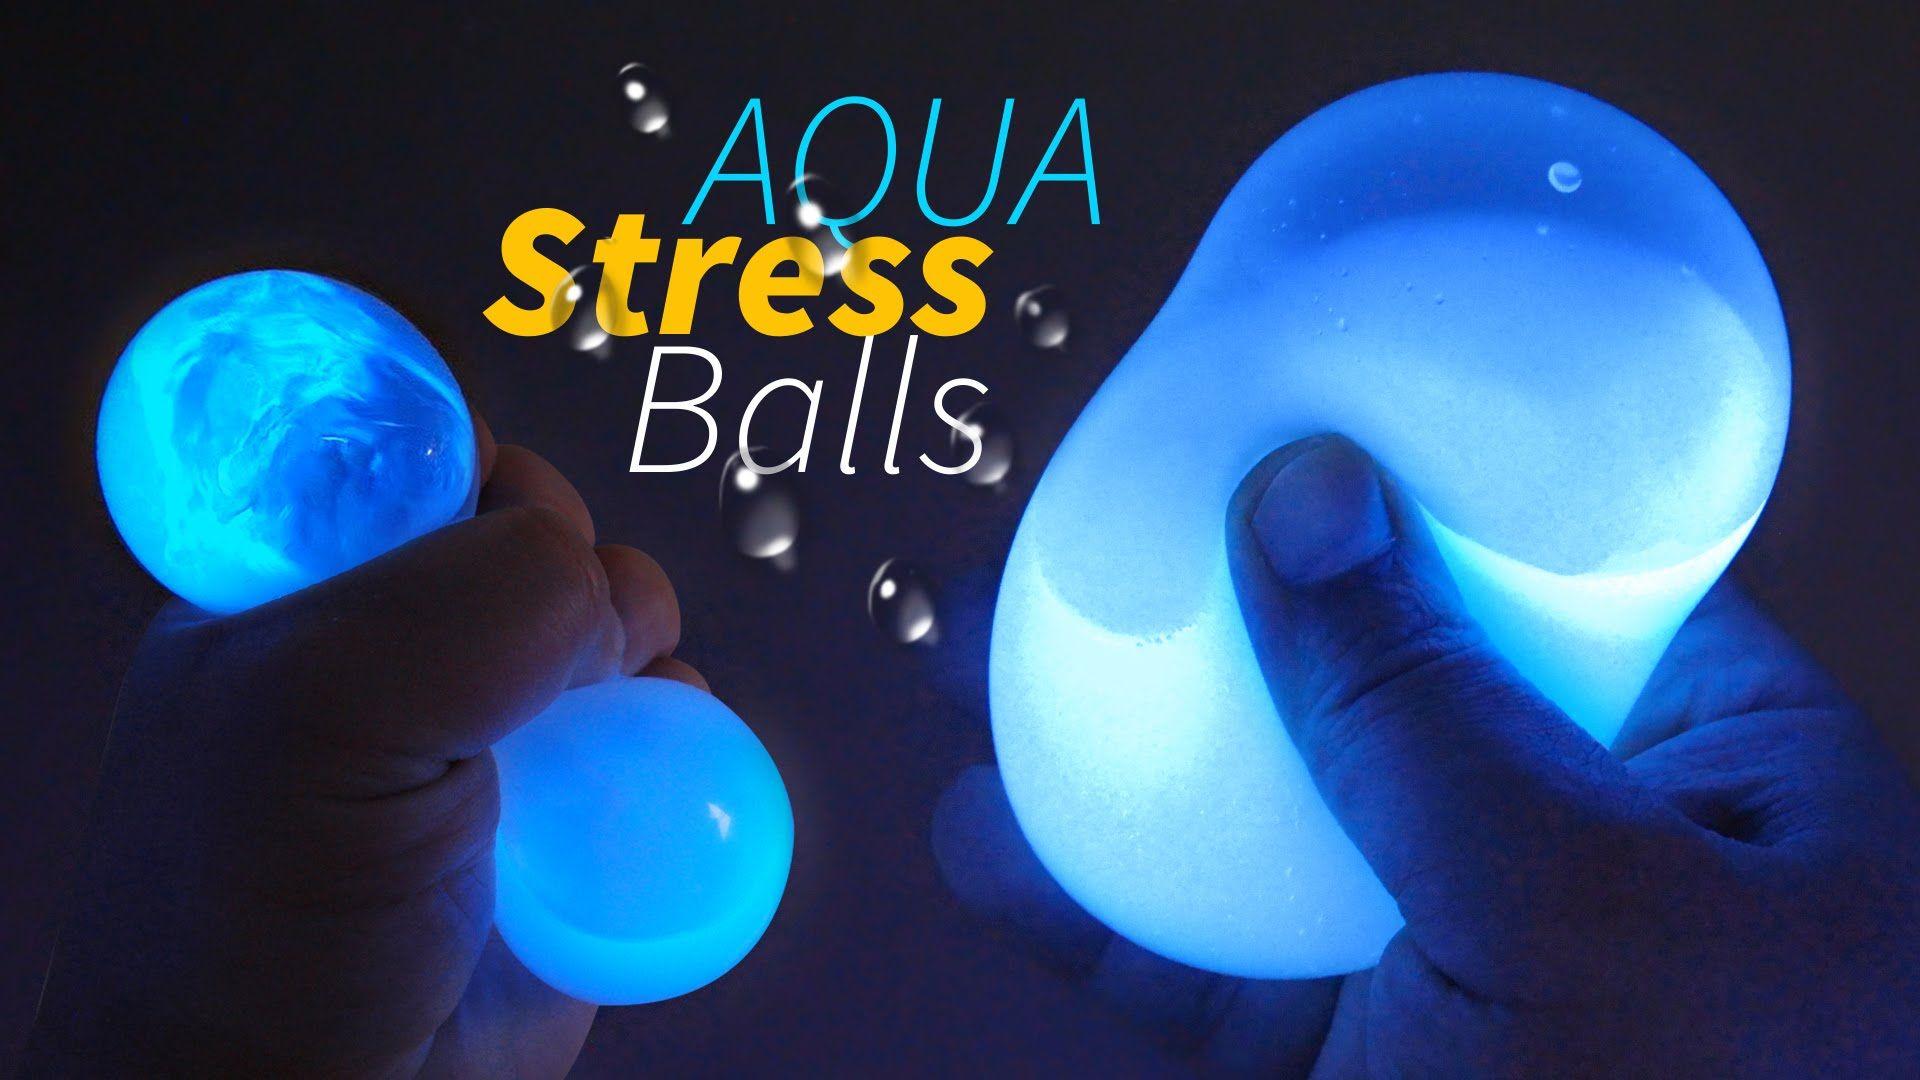 DIY GLOW AQUA Squishy Stress Balls How to Make Liquid Stress